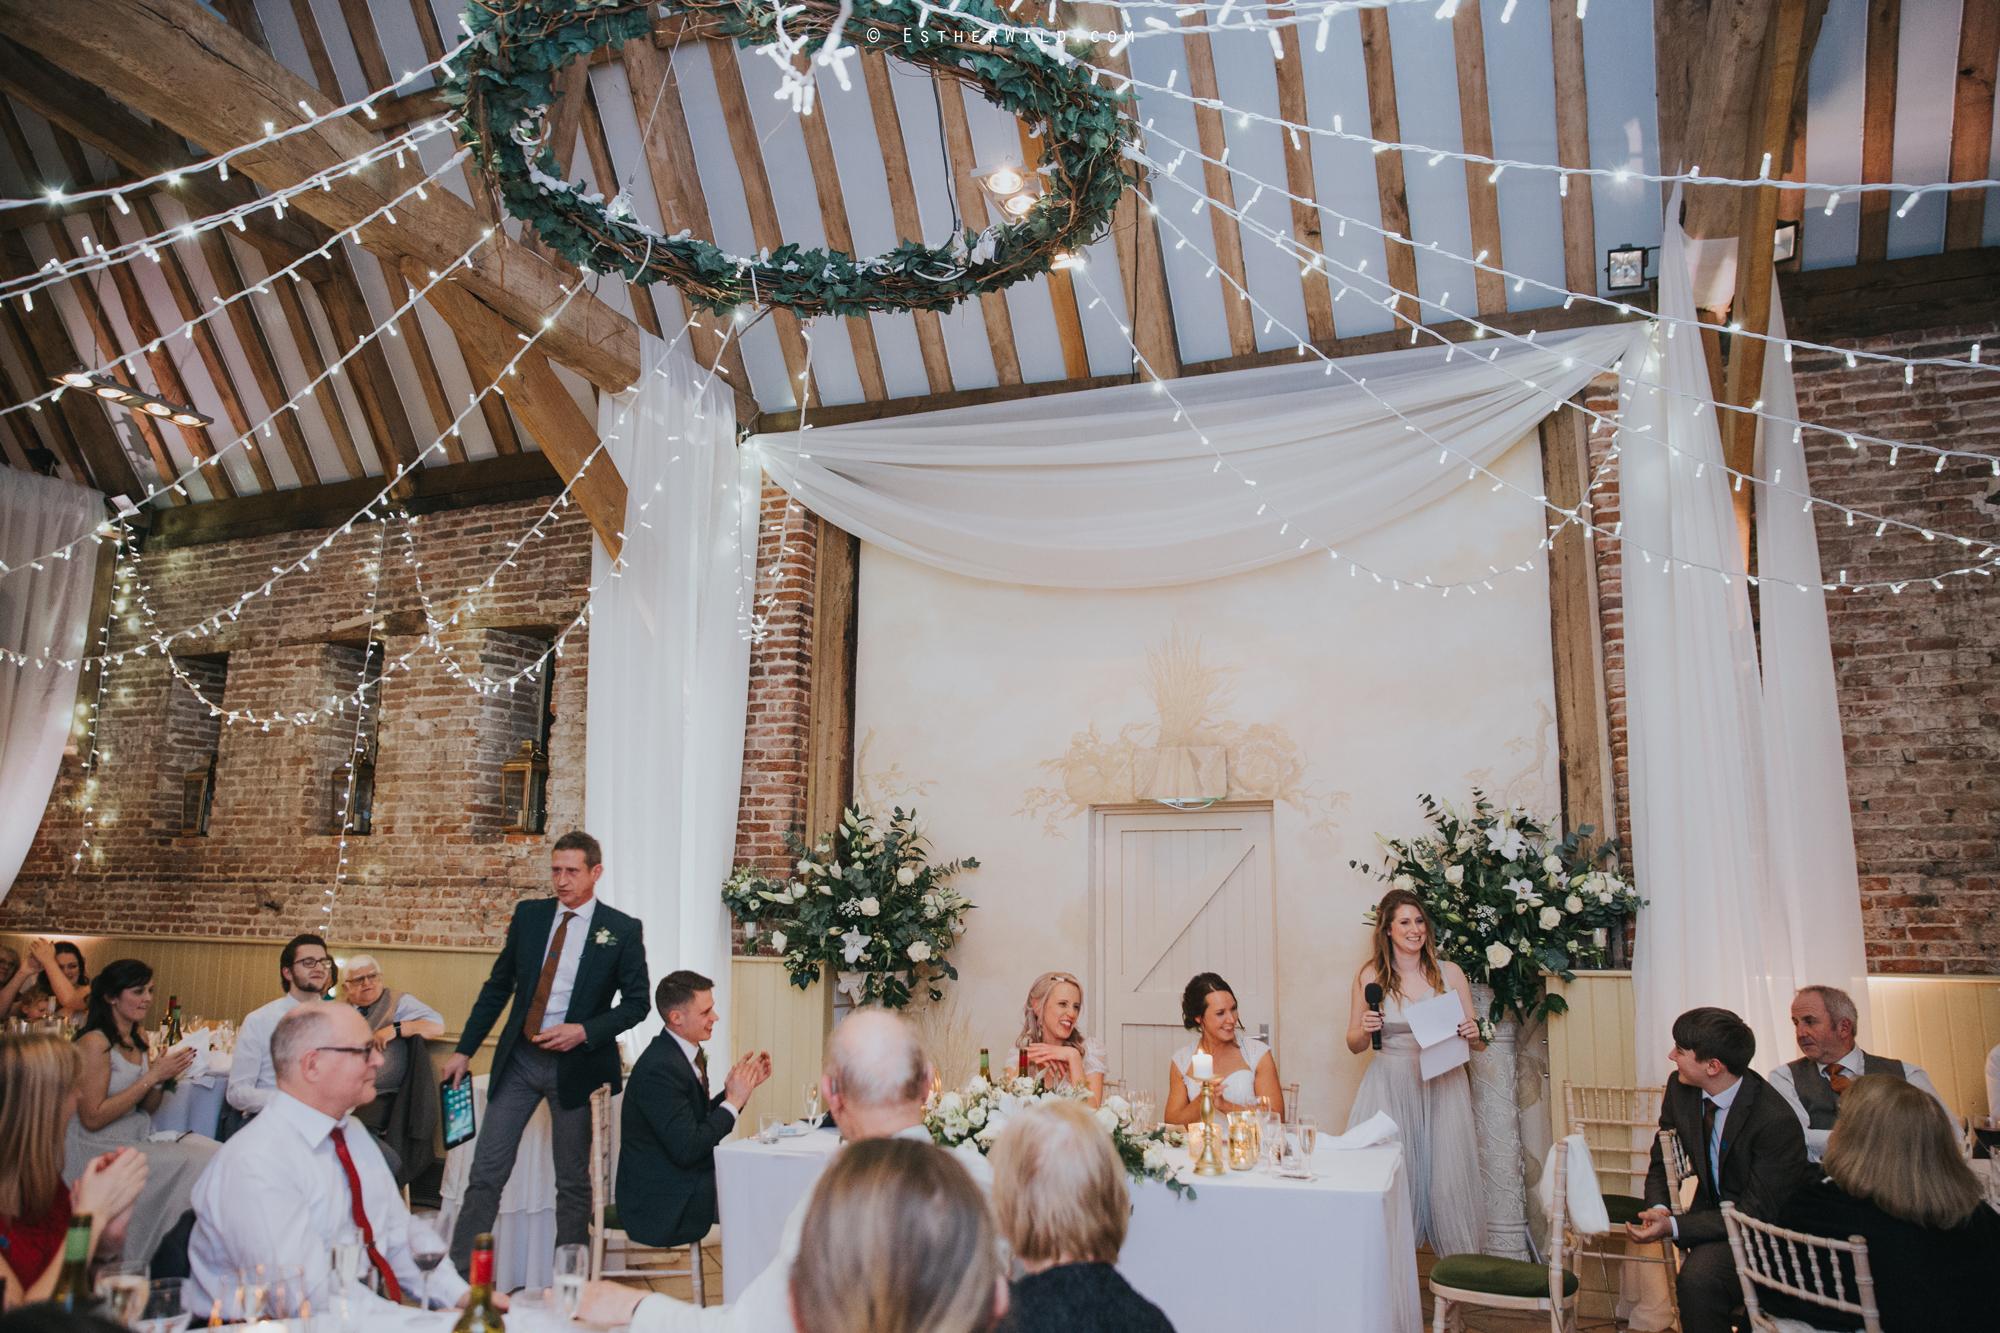 Elms_Barn_Weddings_Suffolk_Photographer_Copyright_Esther_Wild_IMG_2683.jpg